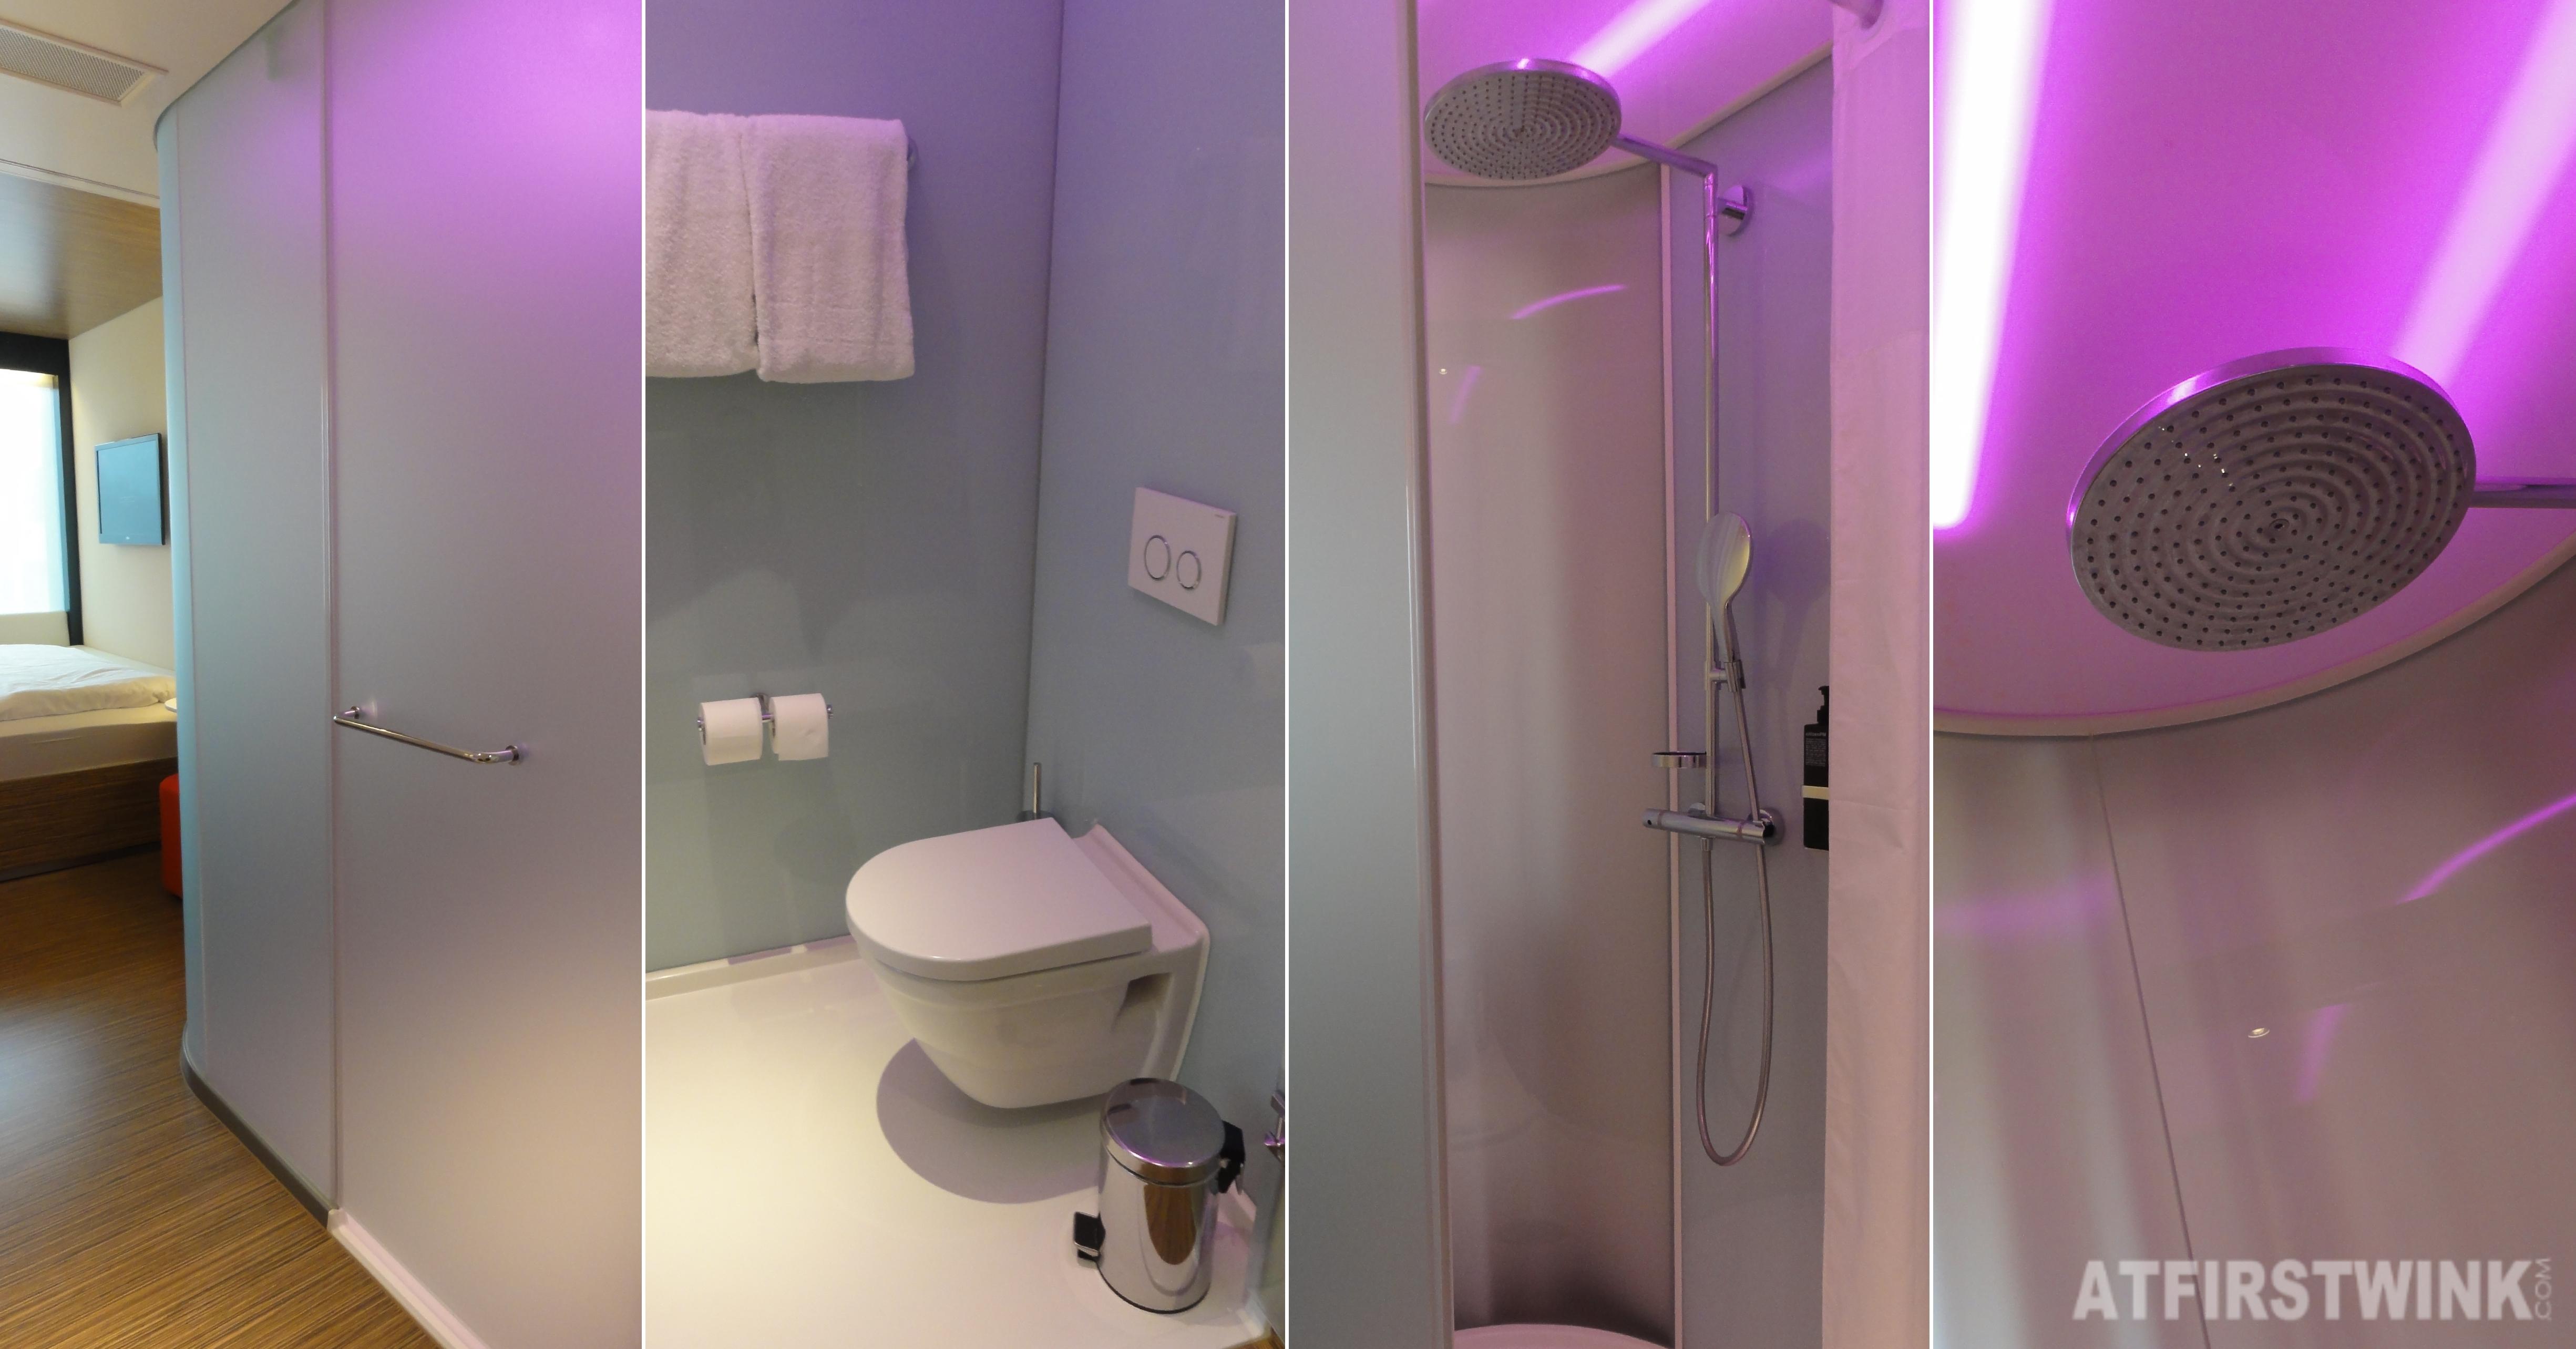 citizenM hotel in Rotterdam rain shower toilet neon mood lights